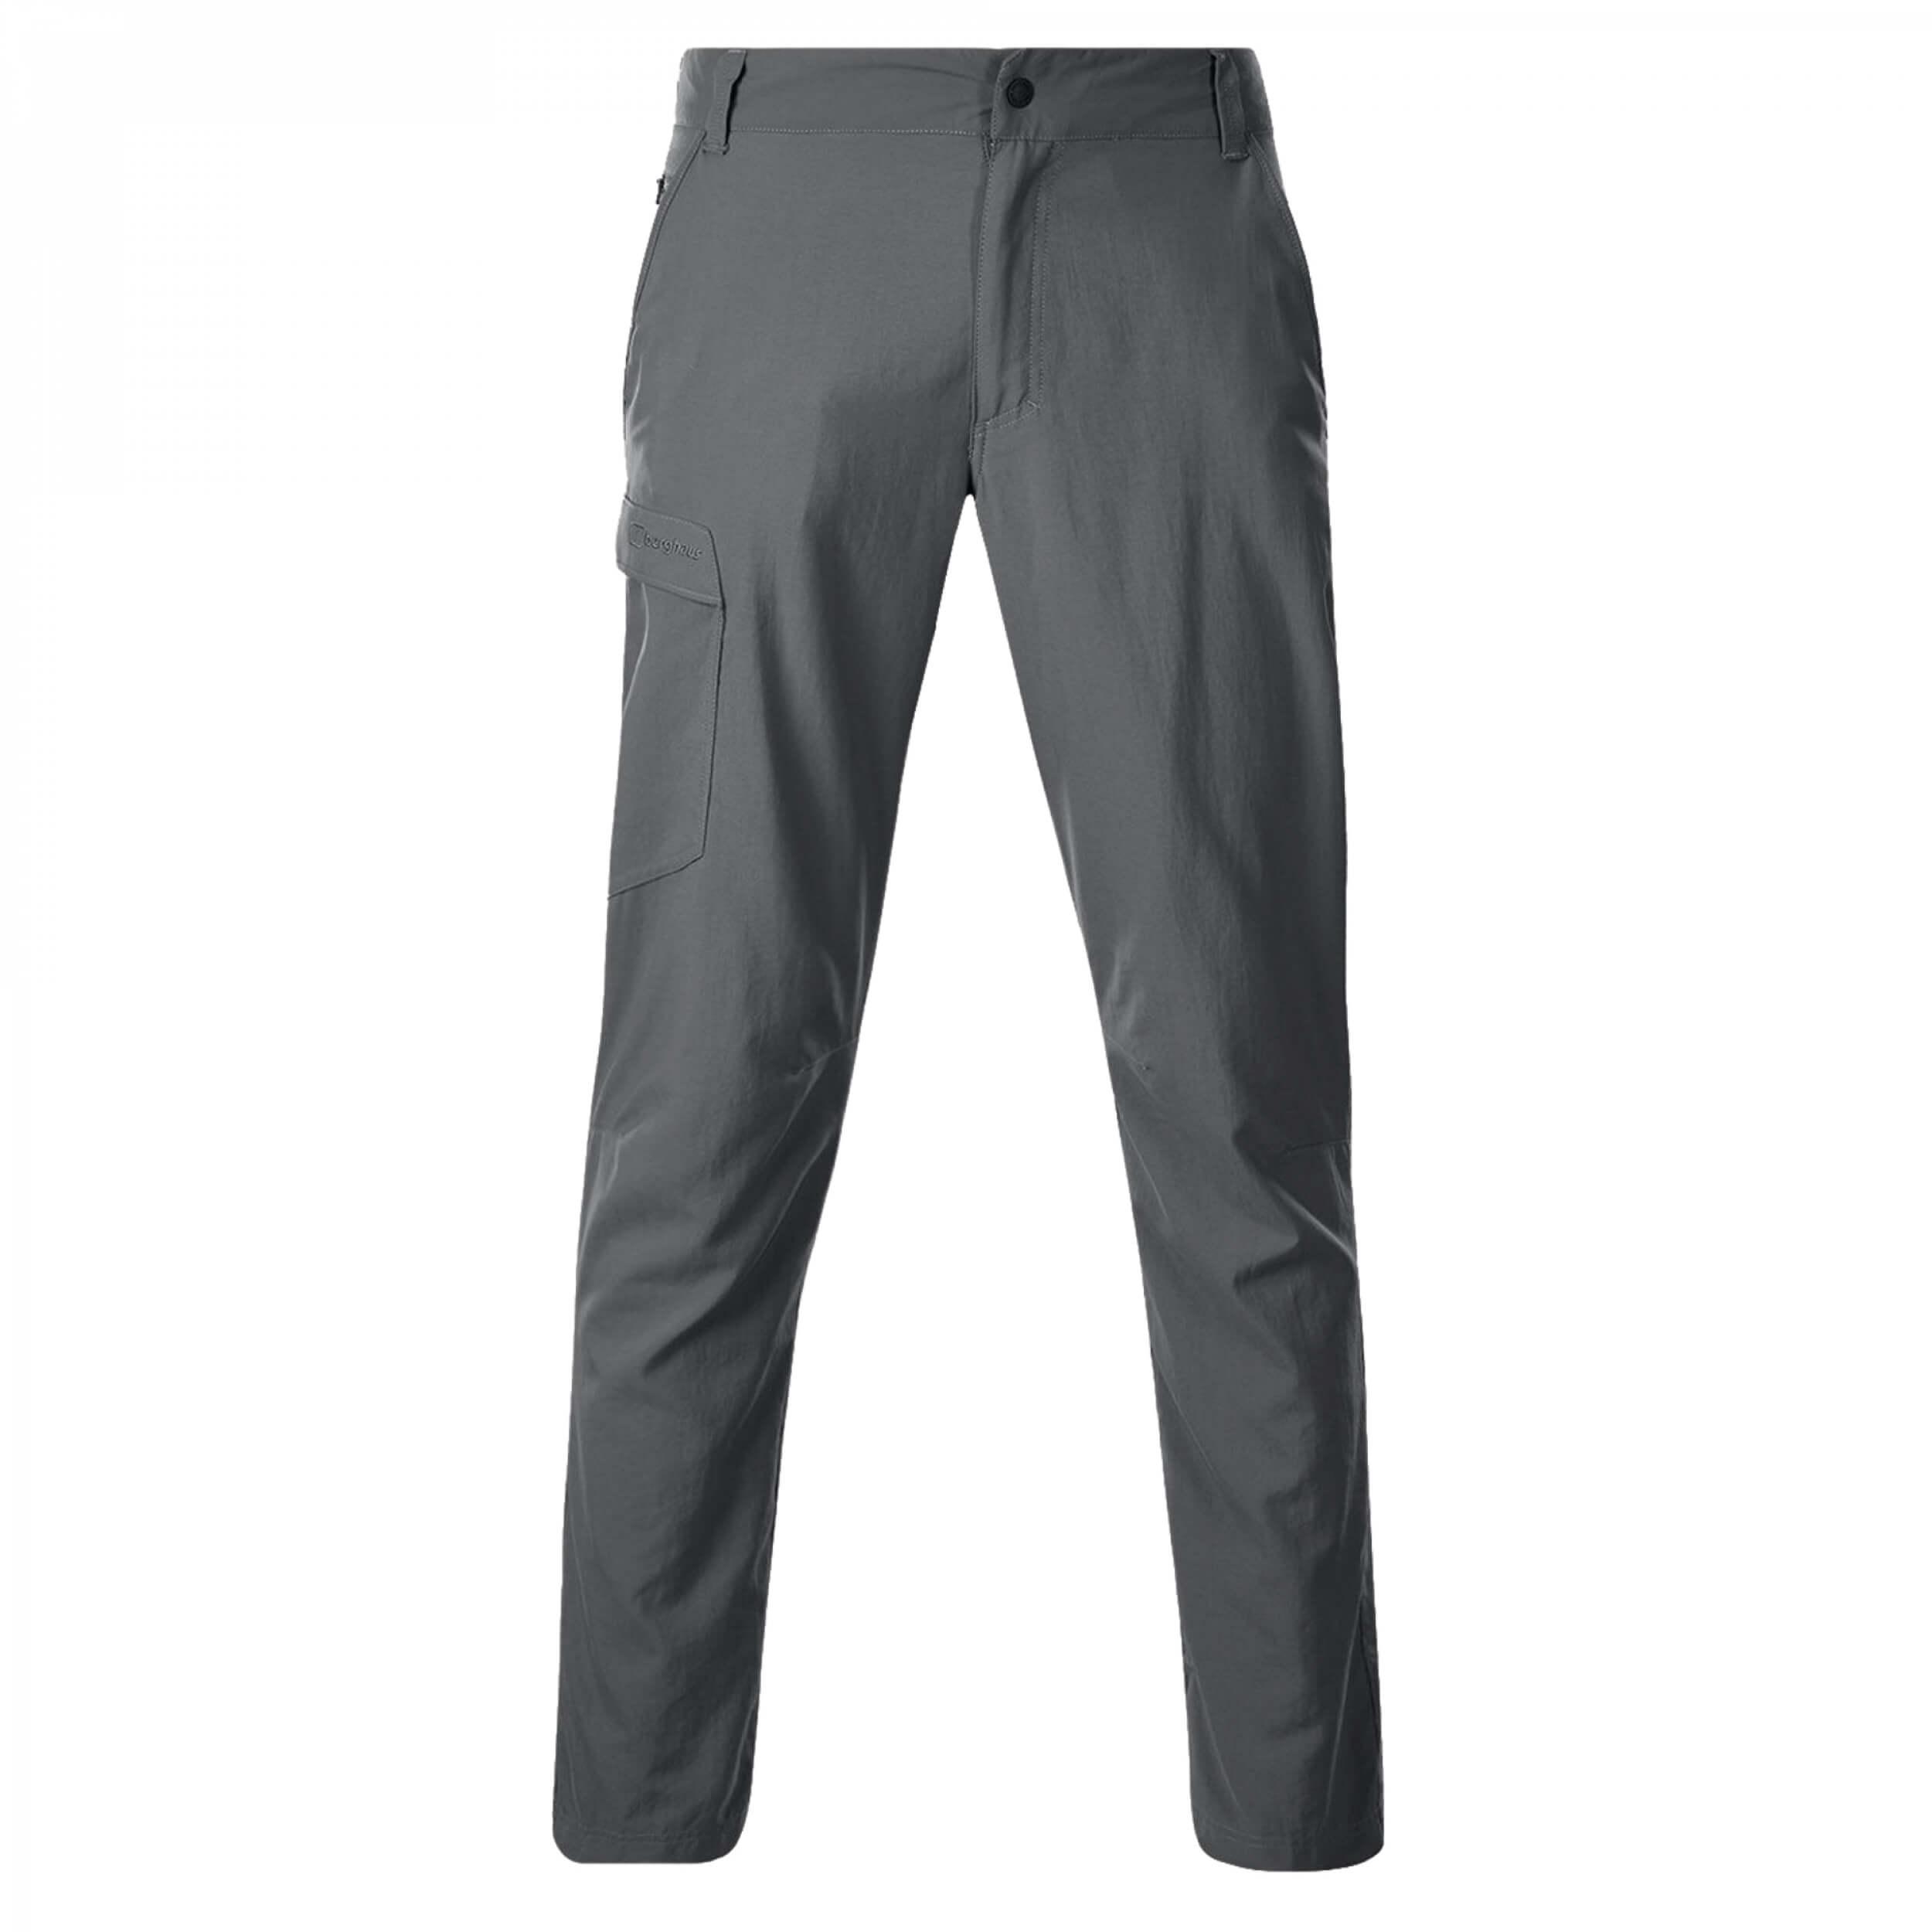 Berghaus Navigator 2.0 Trousers grey